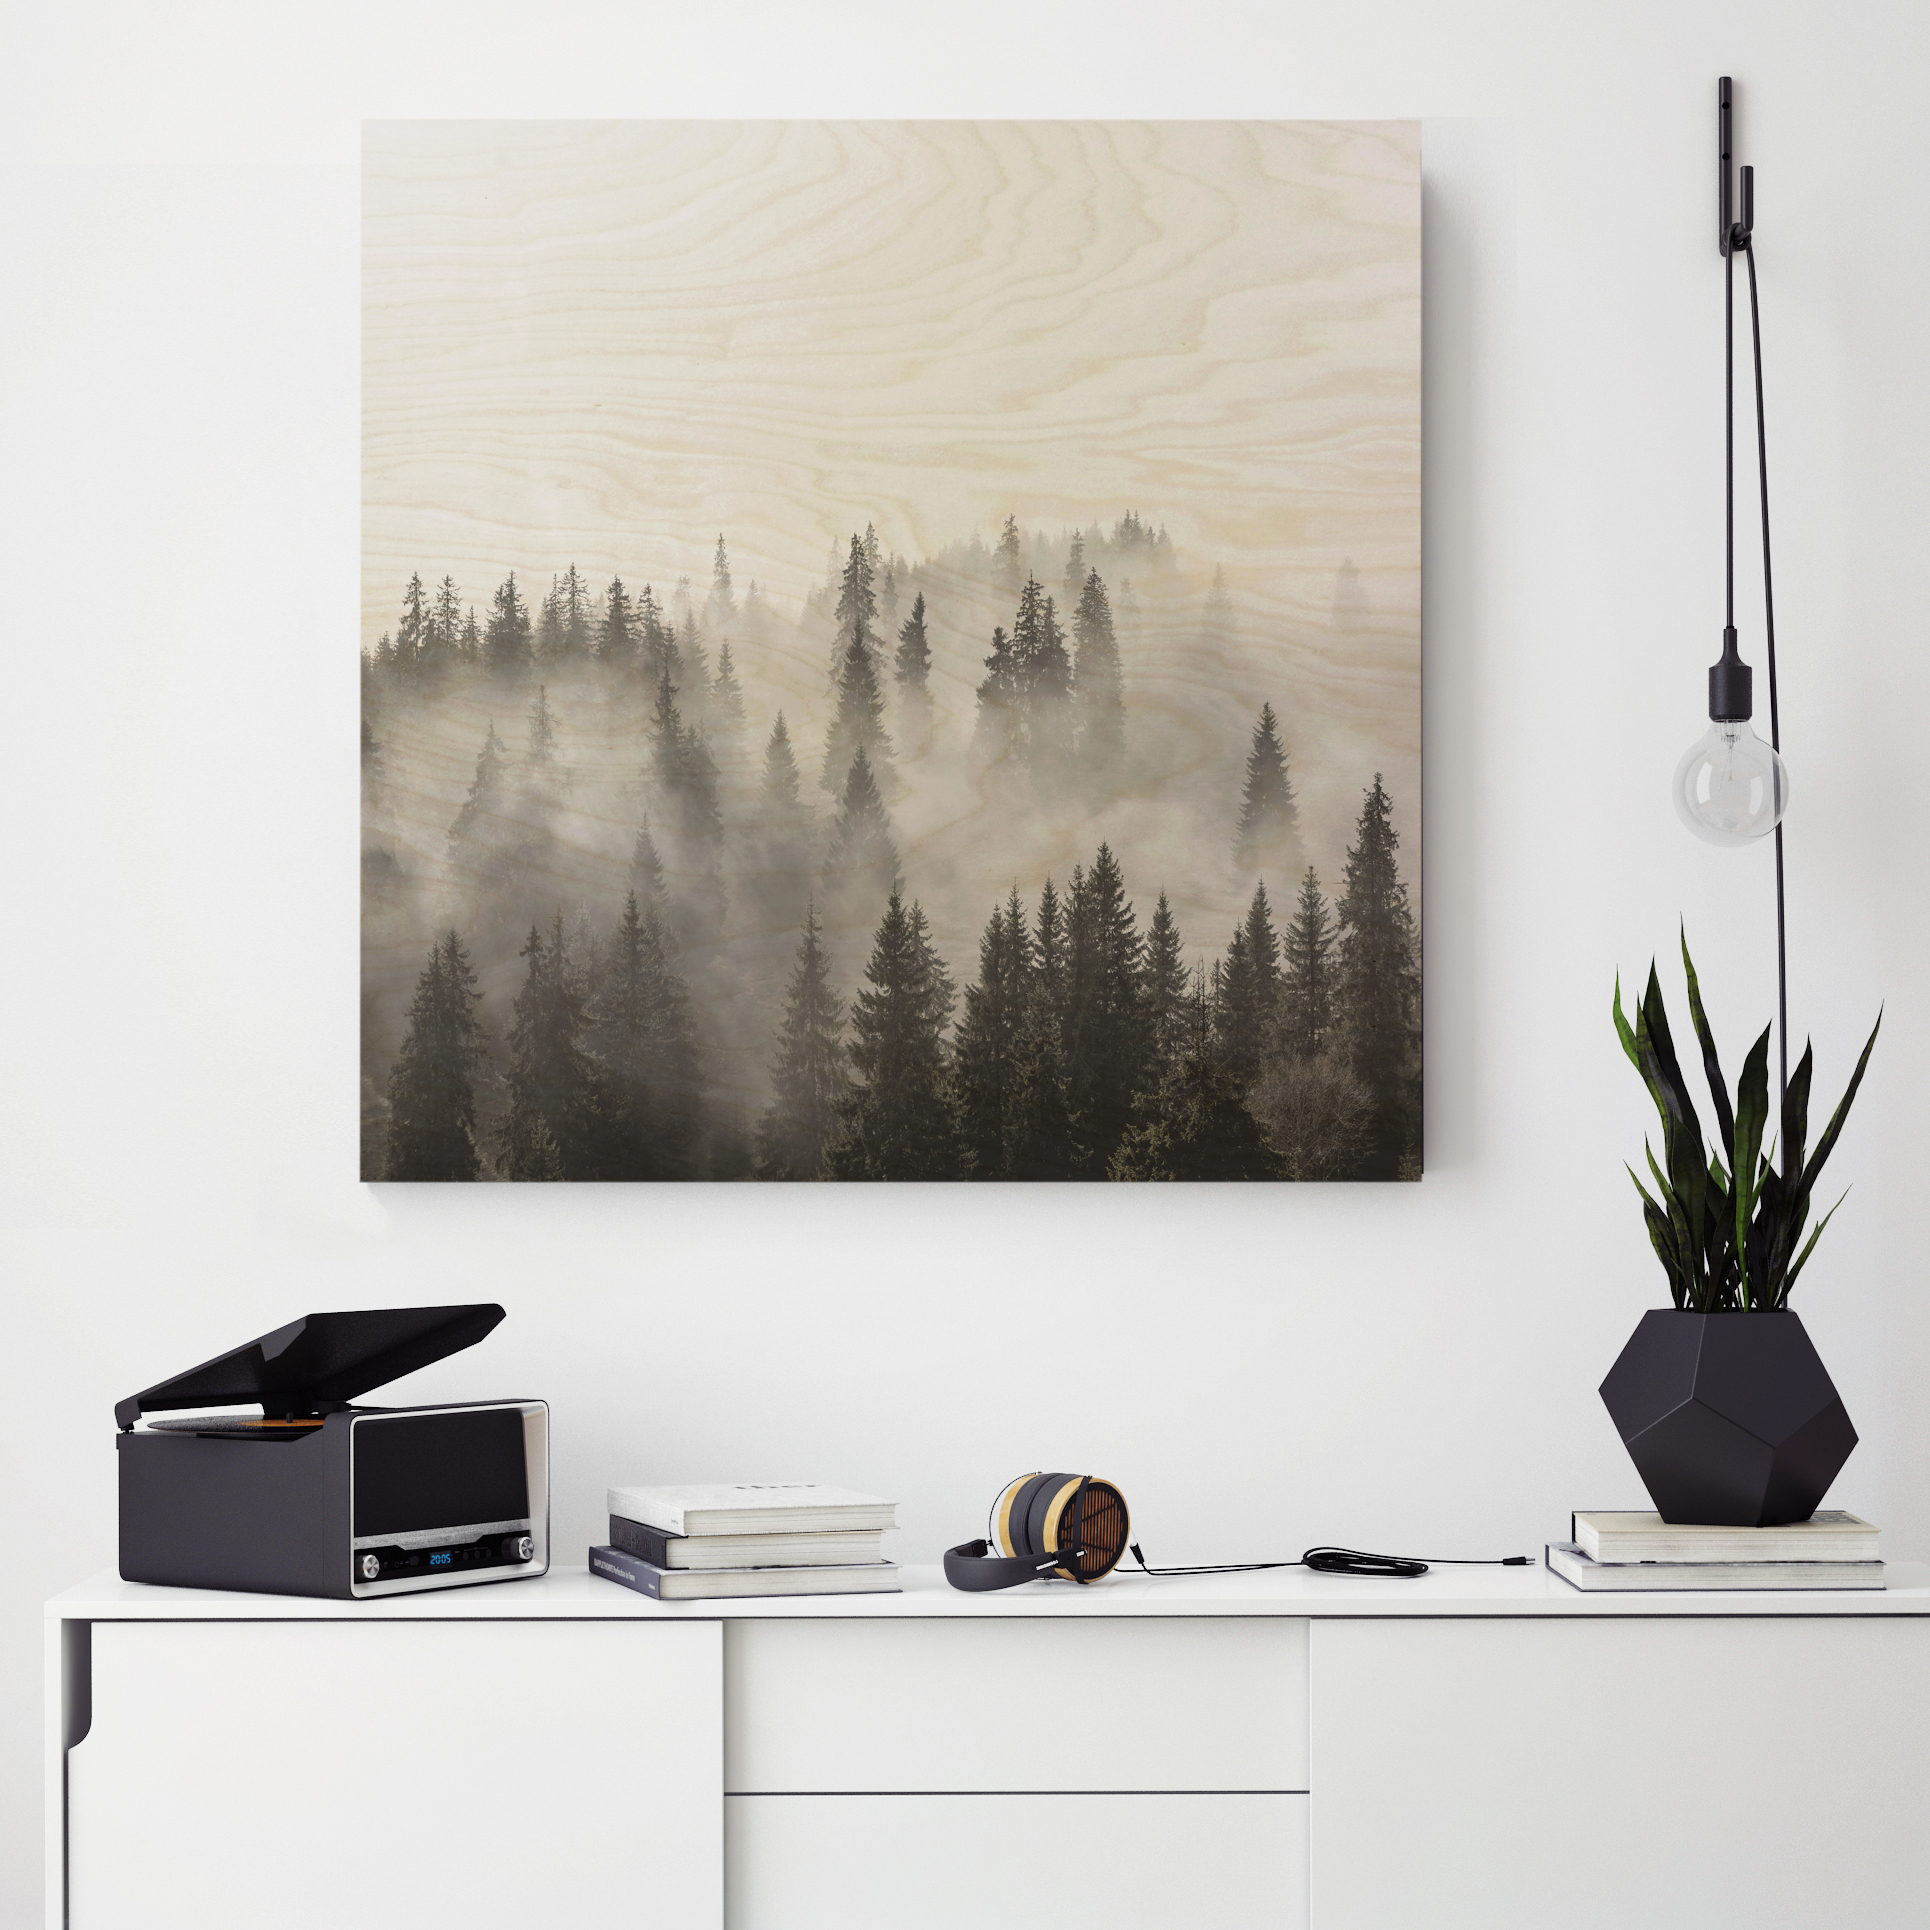 BW forest on original above sideboard.jpg